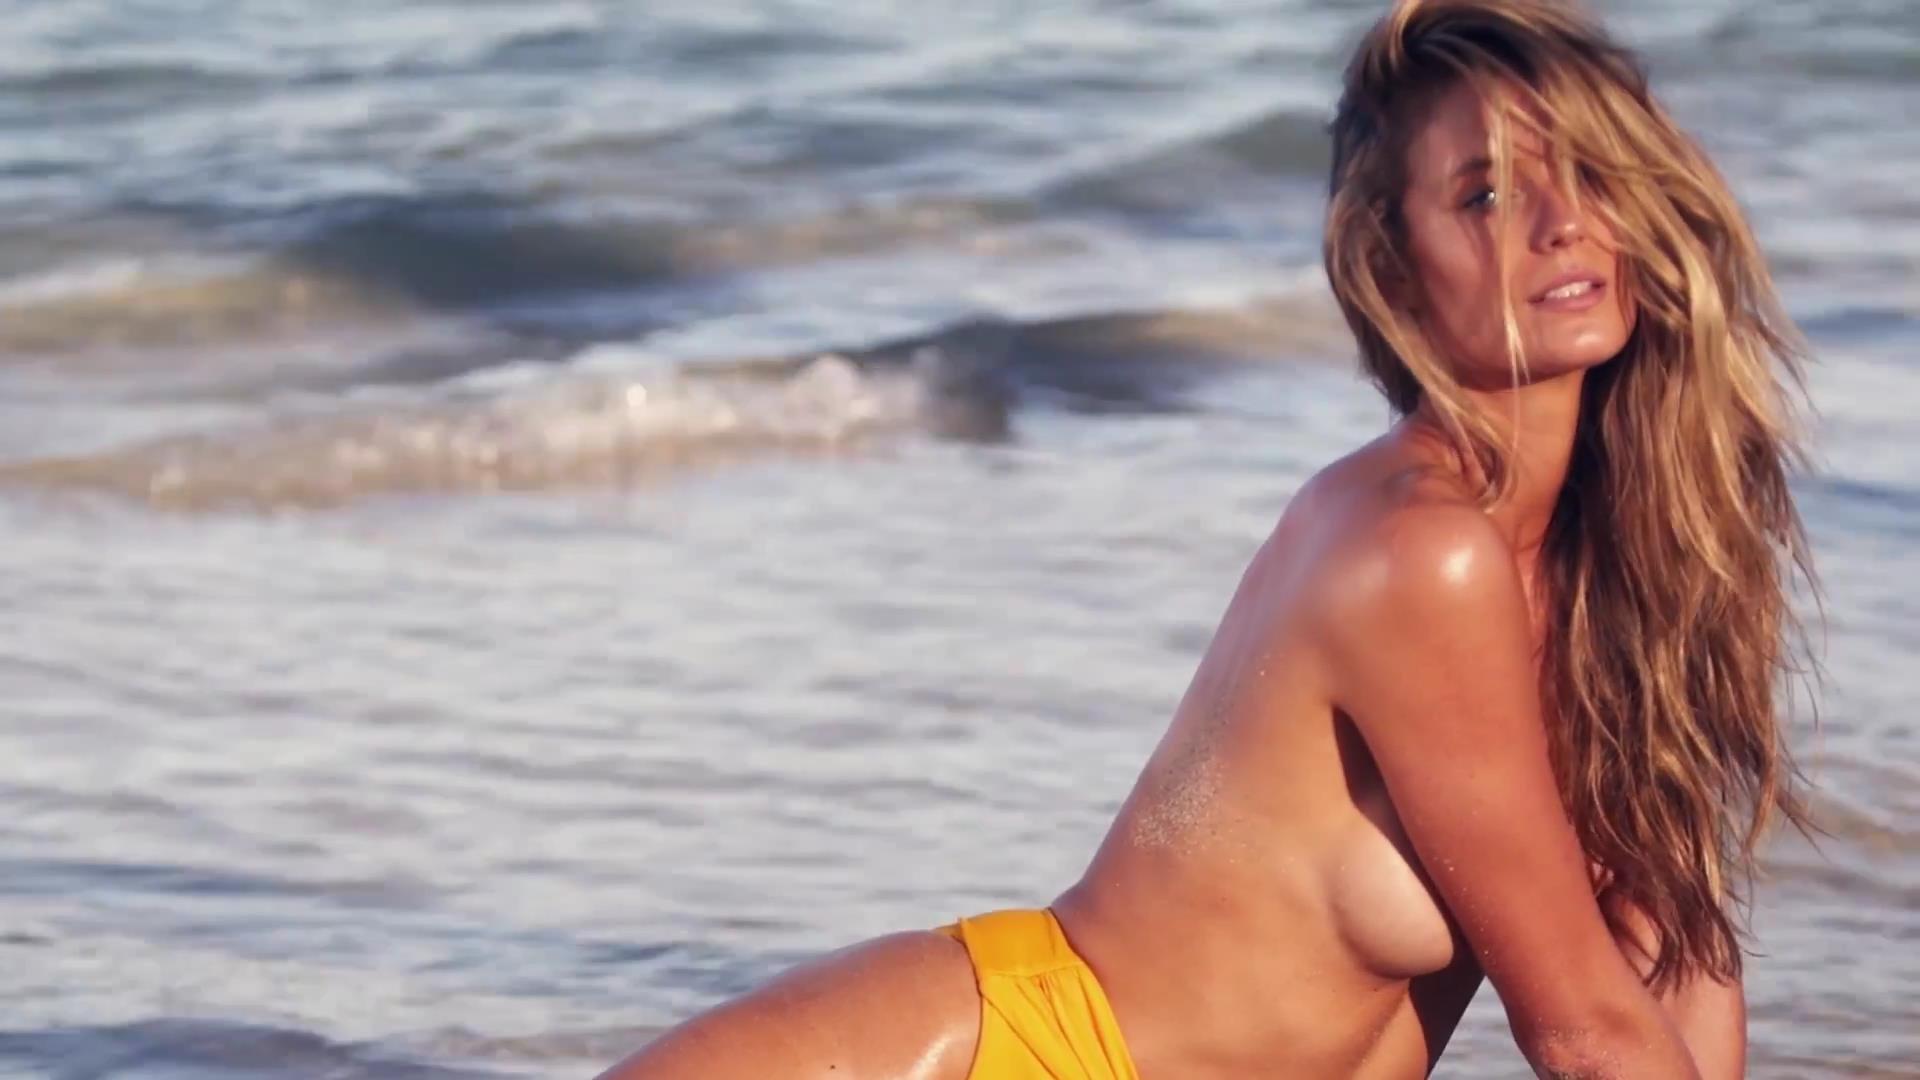 Kate bock in bikini